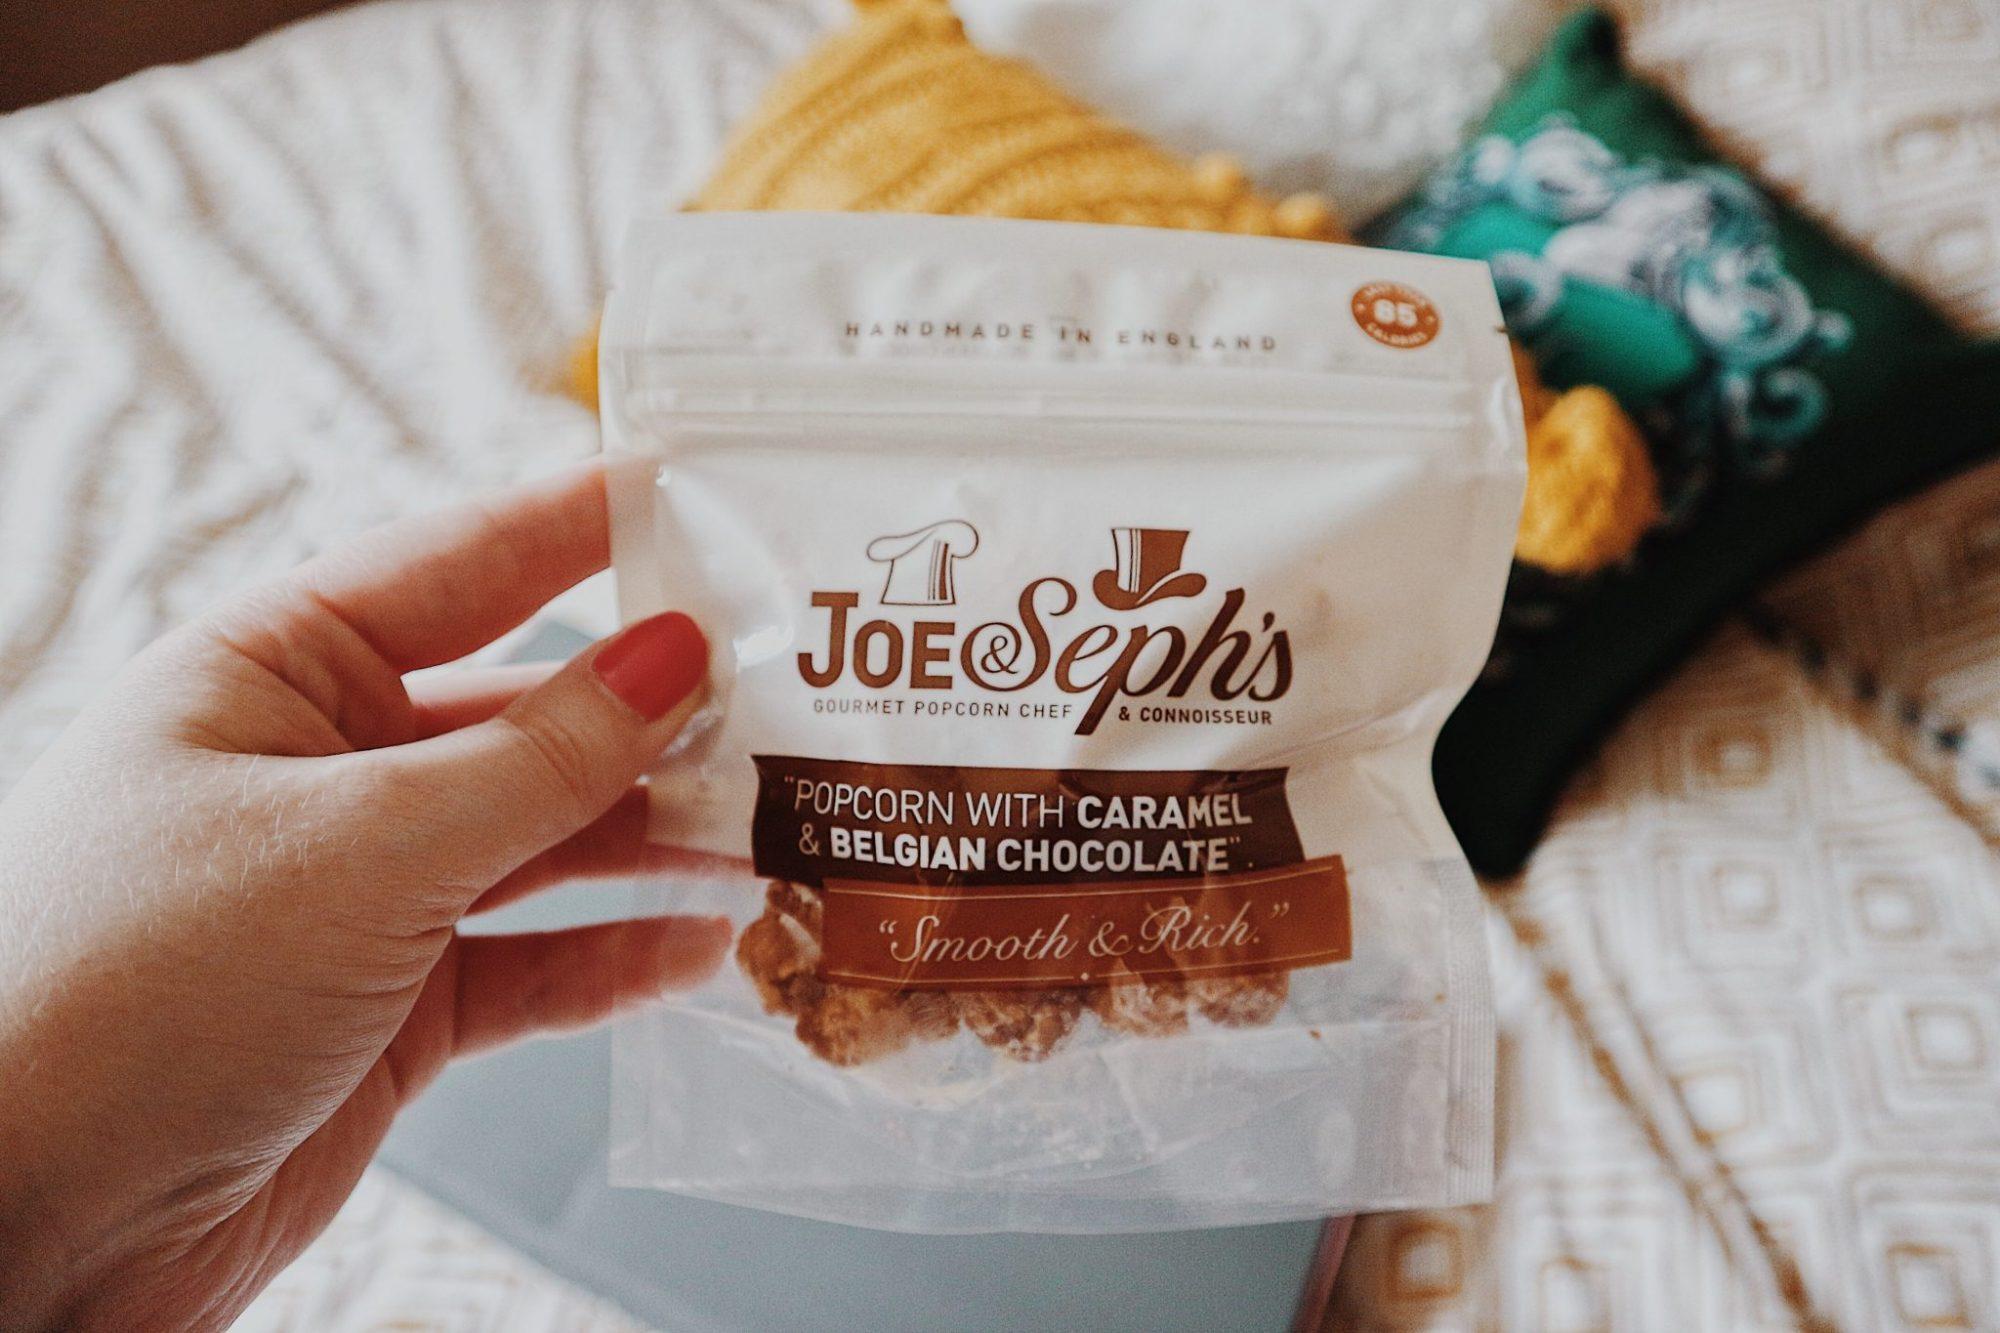 Joe & Seph's Caramel and Belgian Chocolate Popcorn